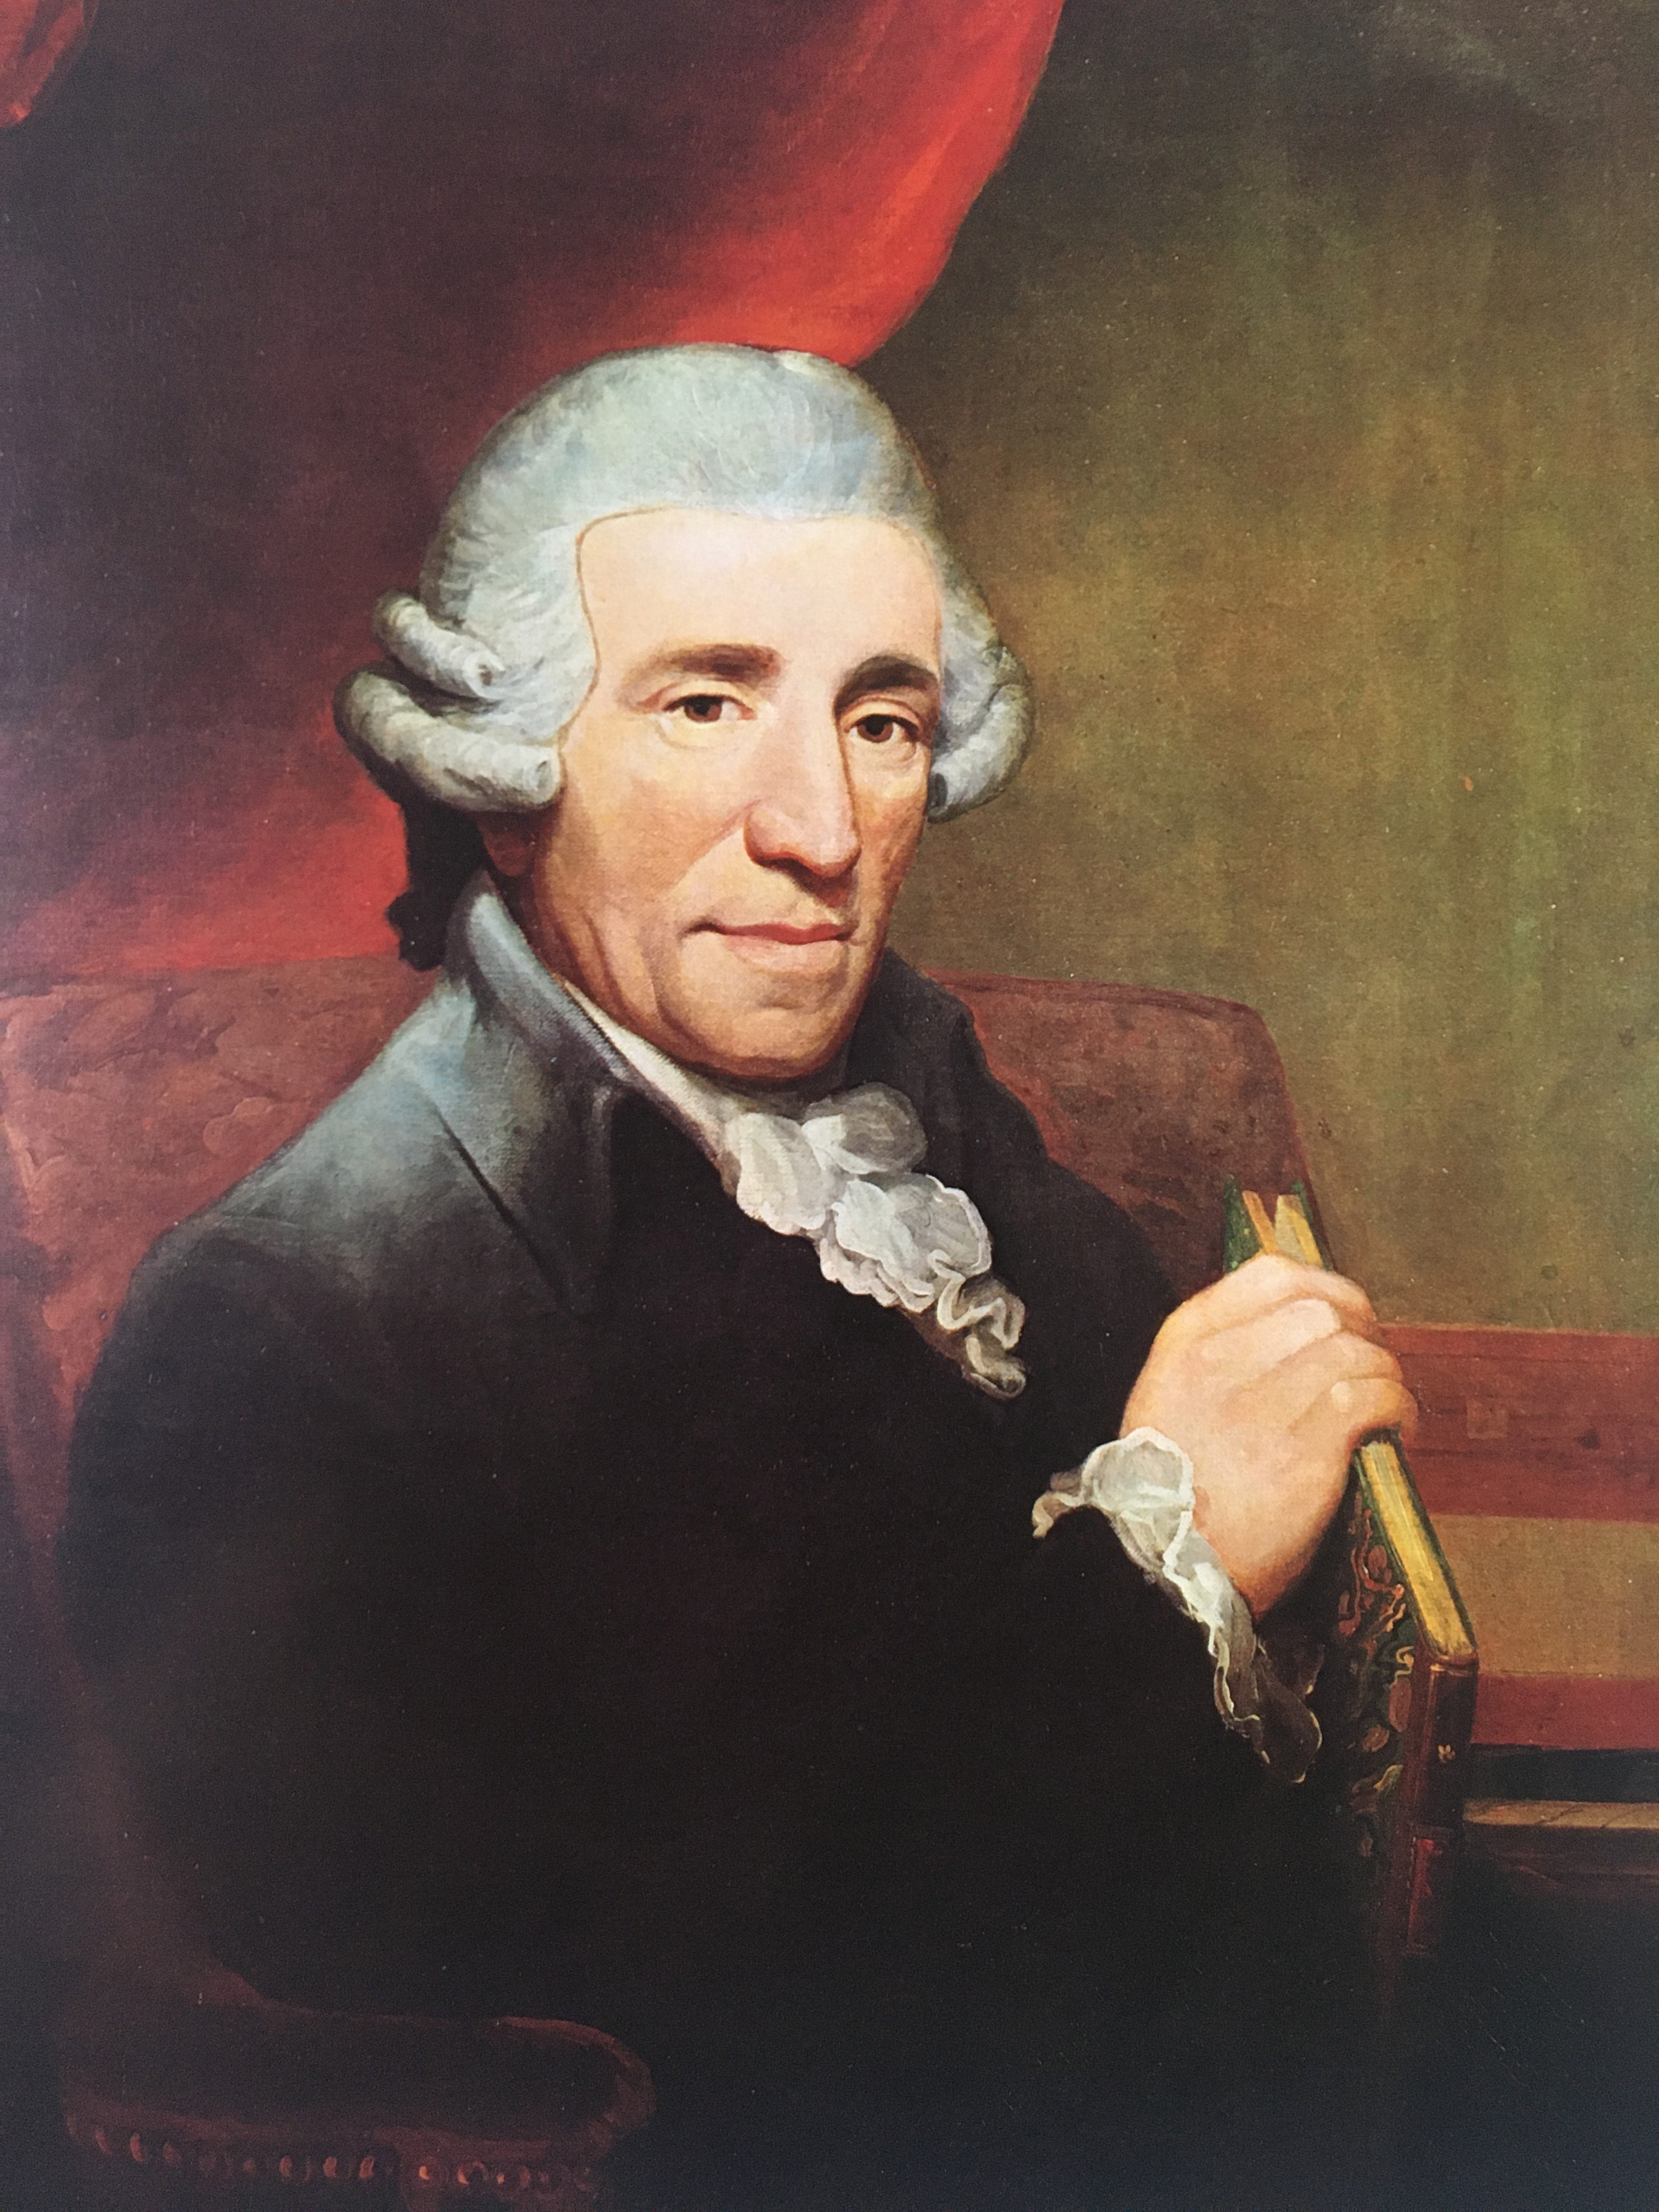 Haydnjpeg